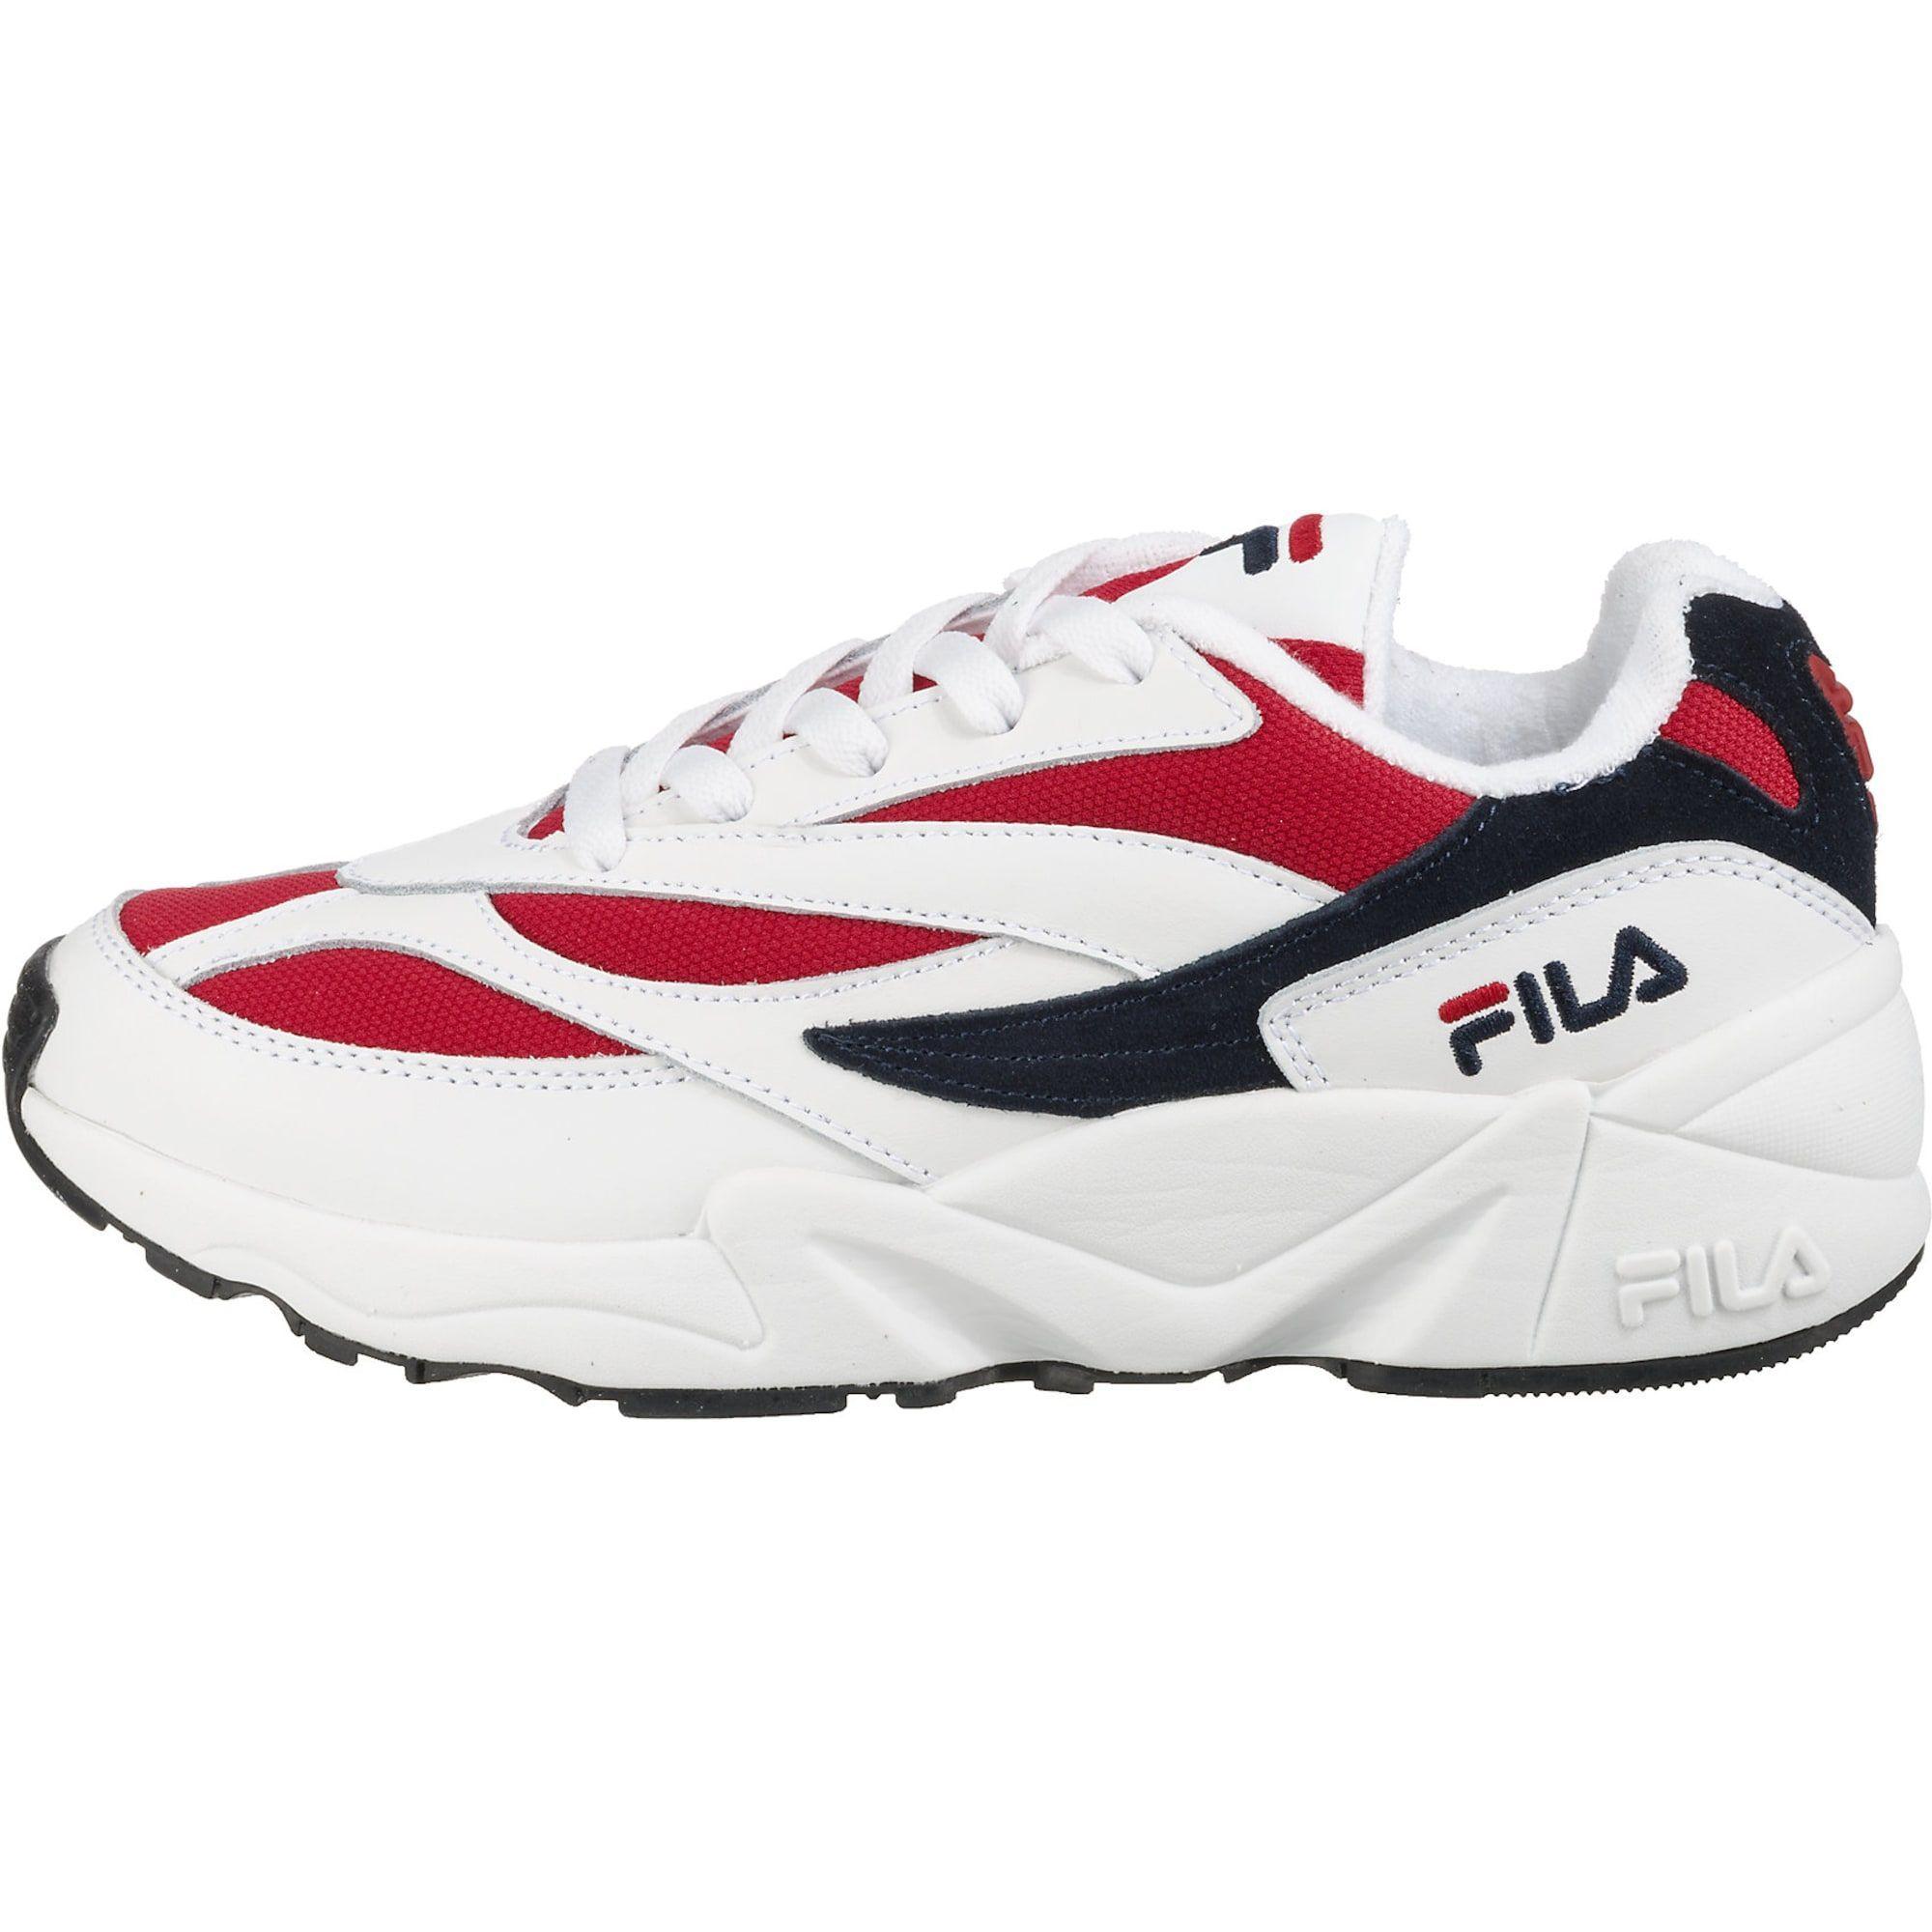 FILA Sneakers Low 'Venom' Damen, Rot Schwarz Weiß, Größe